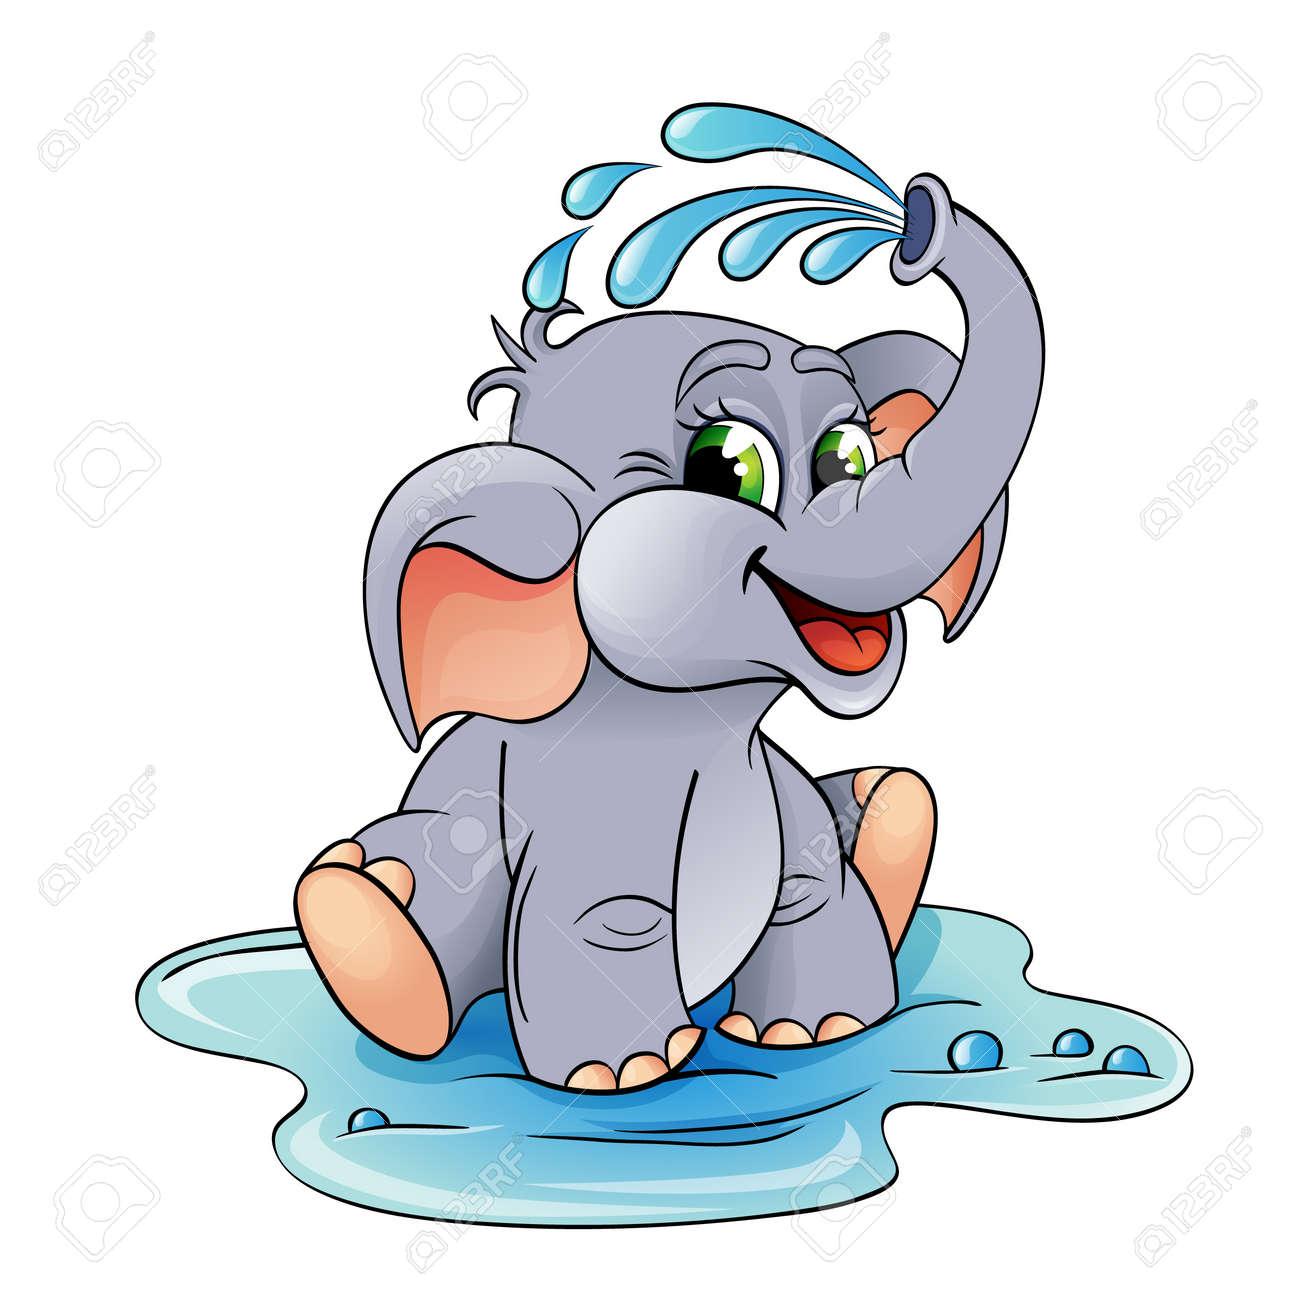 Divertidos Dibujos Animados Bebé Elefante Que él Vierte Con Agua ...